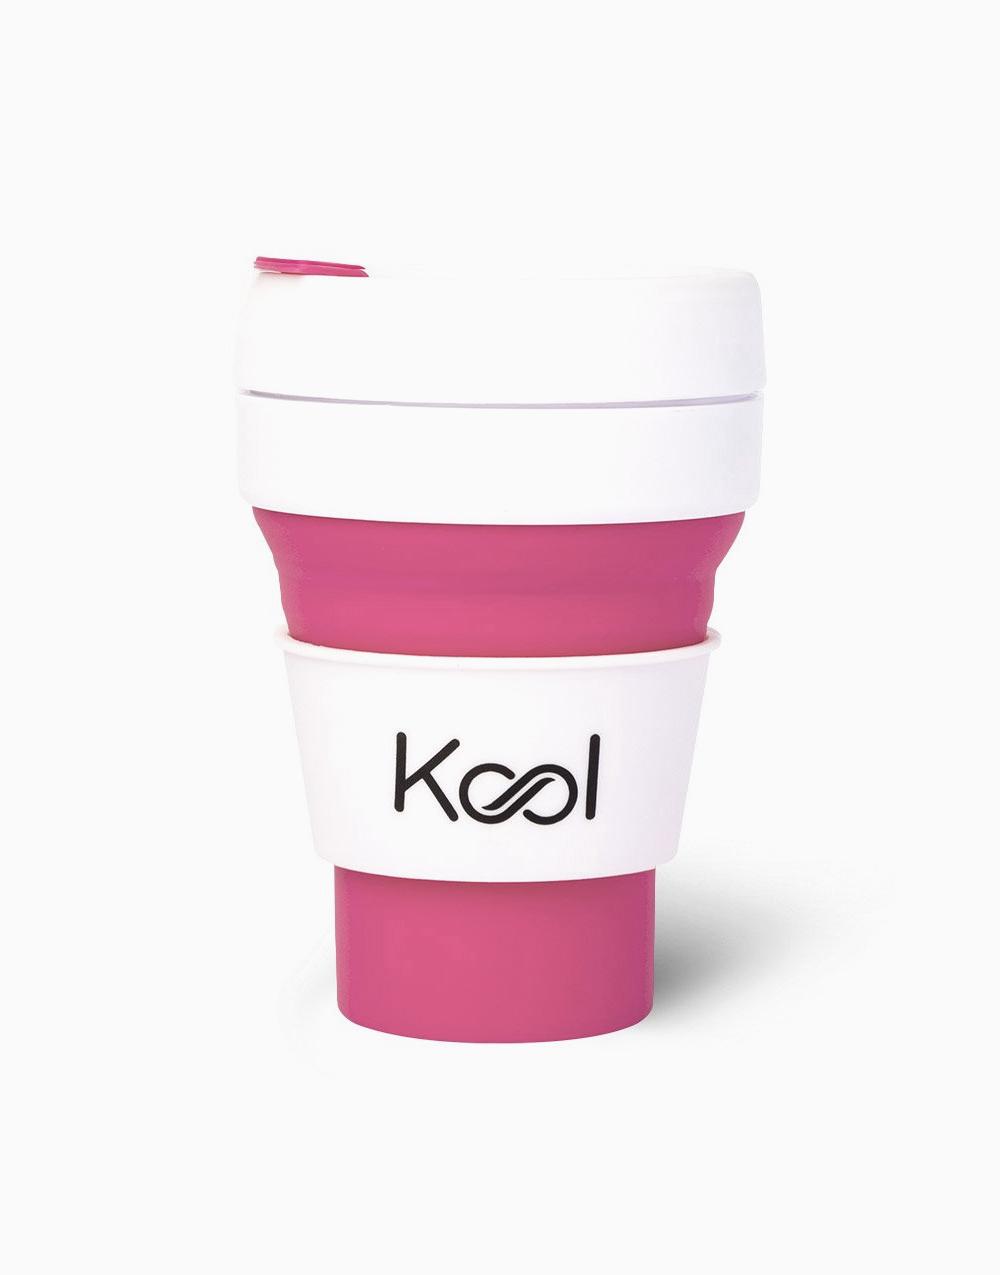 Kool Foldable Cup (355ml) by Kool | Flamingo